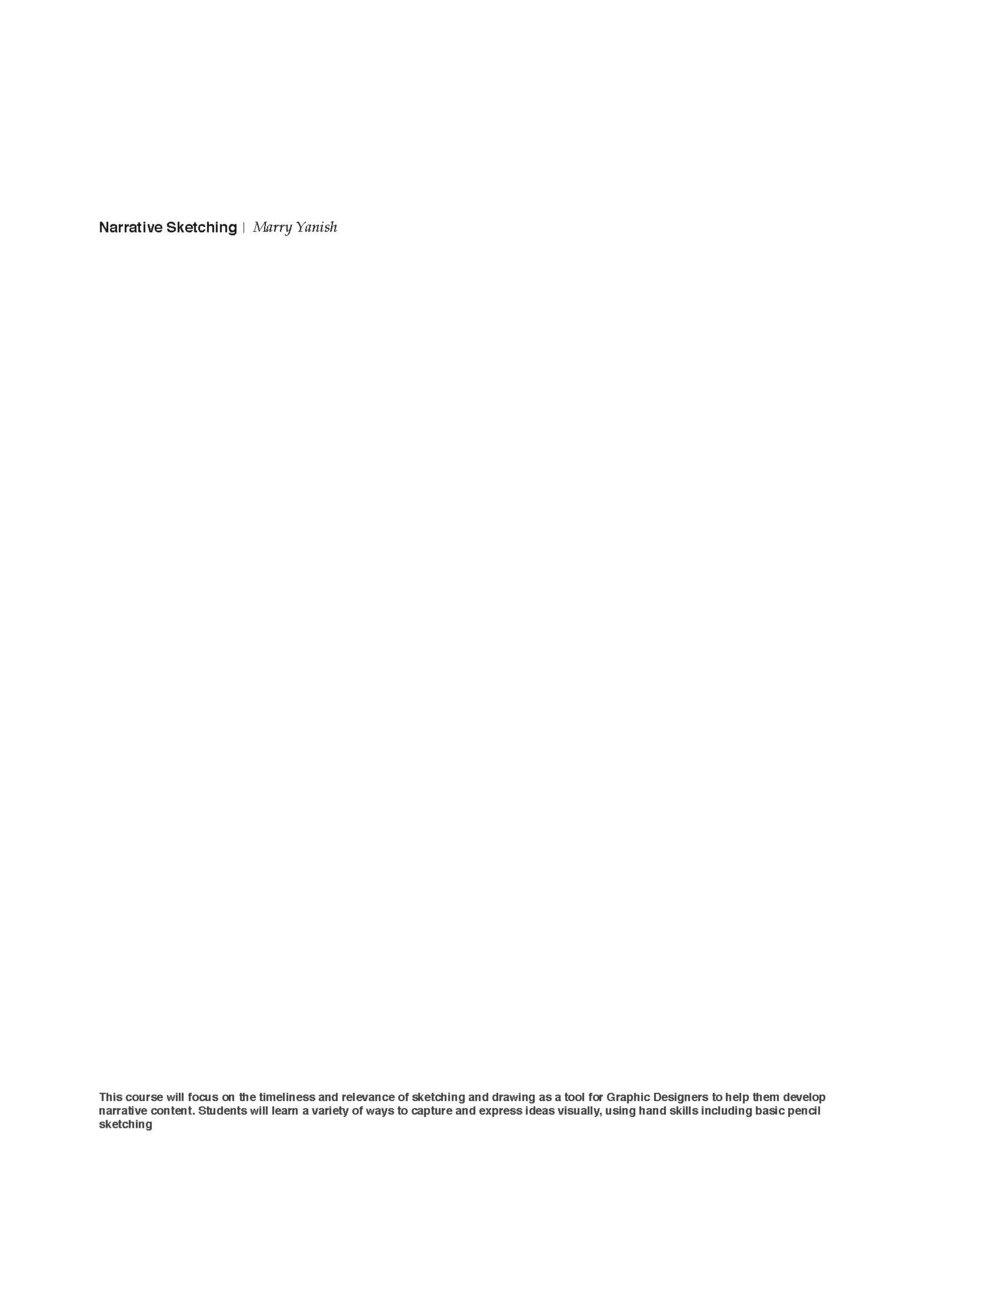 narrative book_Page_03.jpg